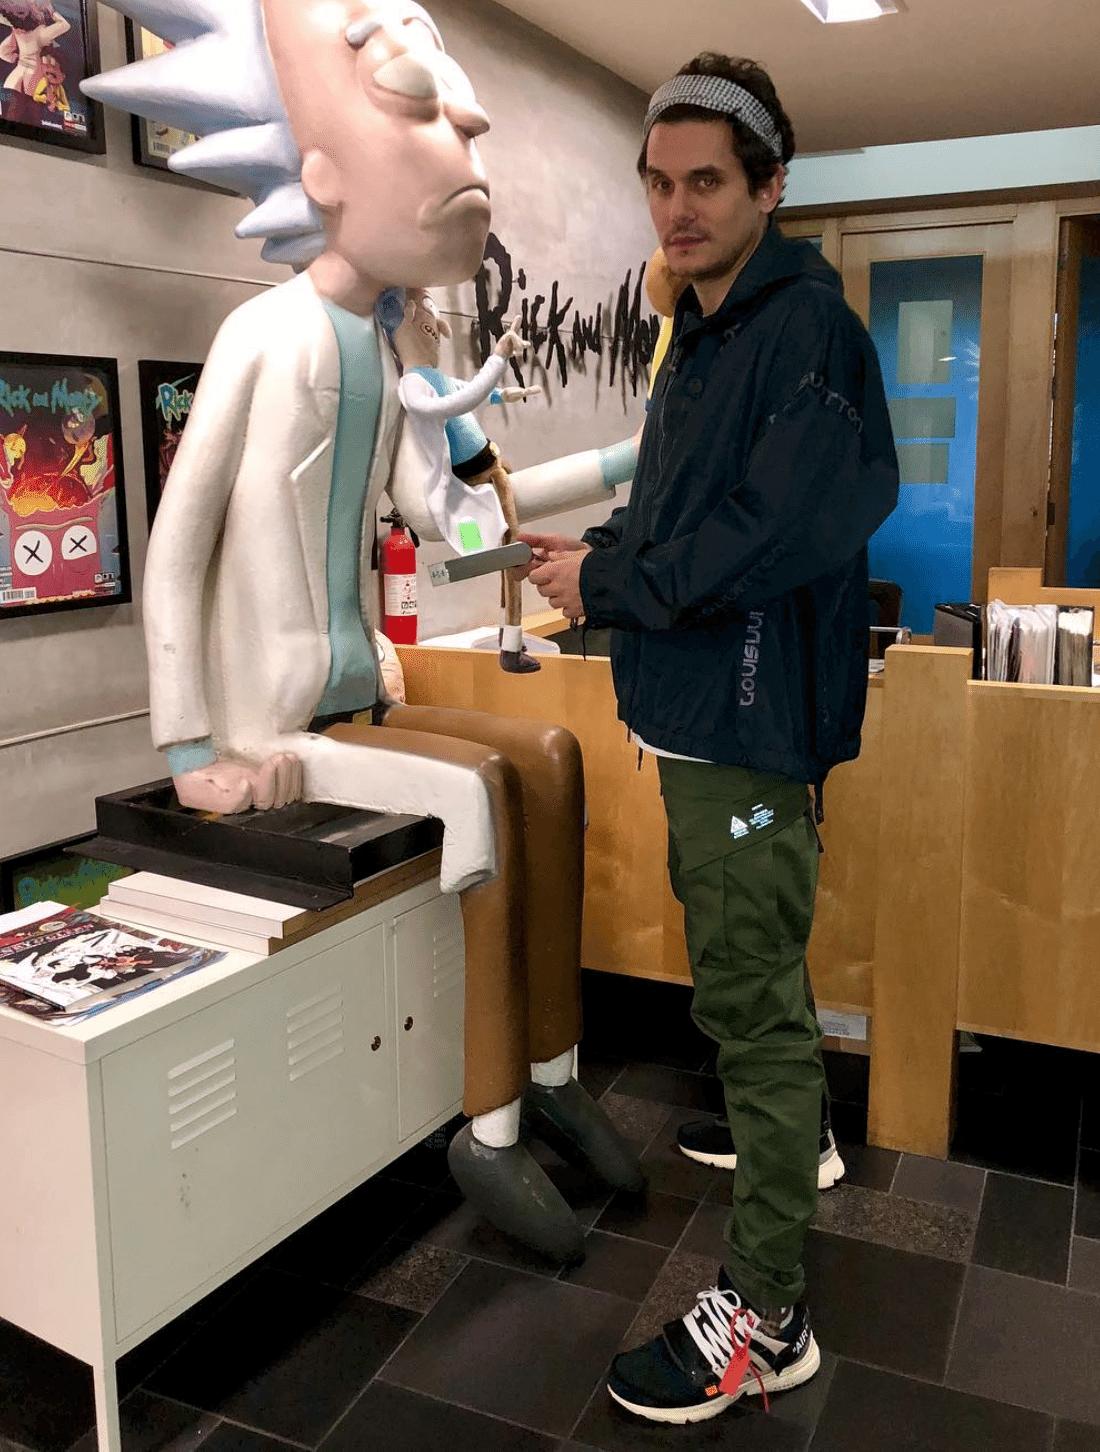 John Mayer in the Off White x Nike Air Presto